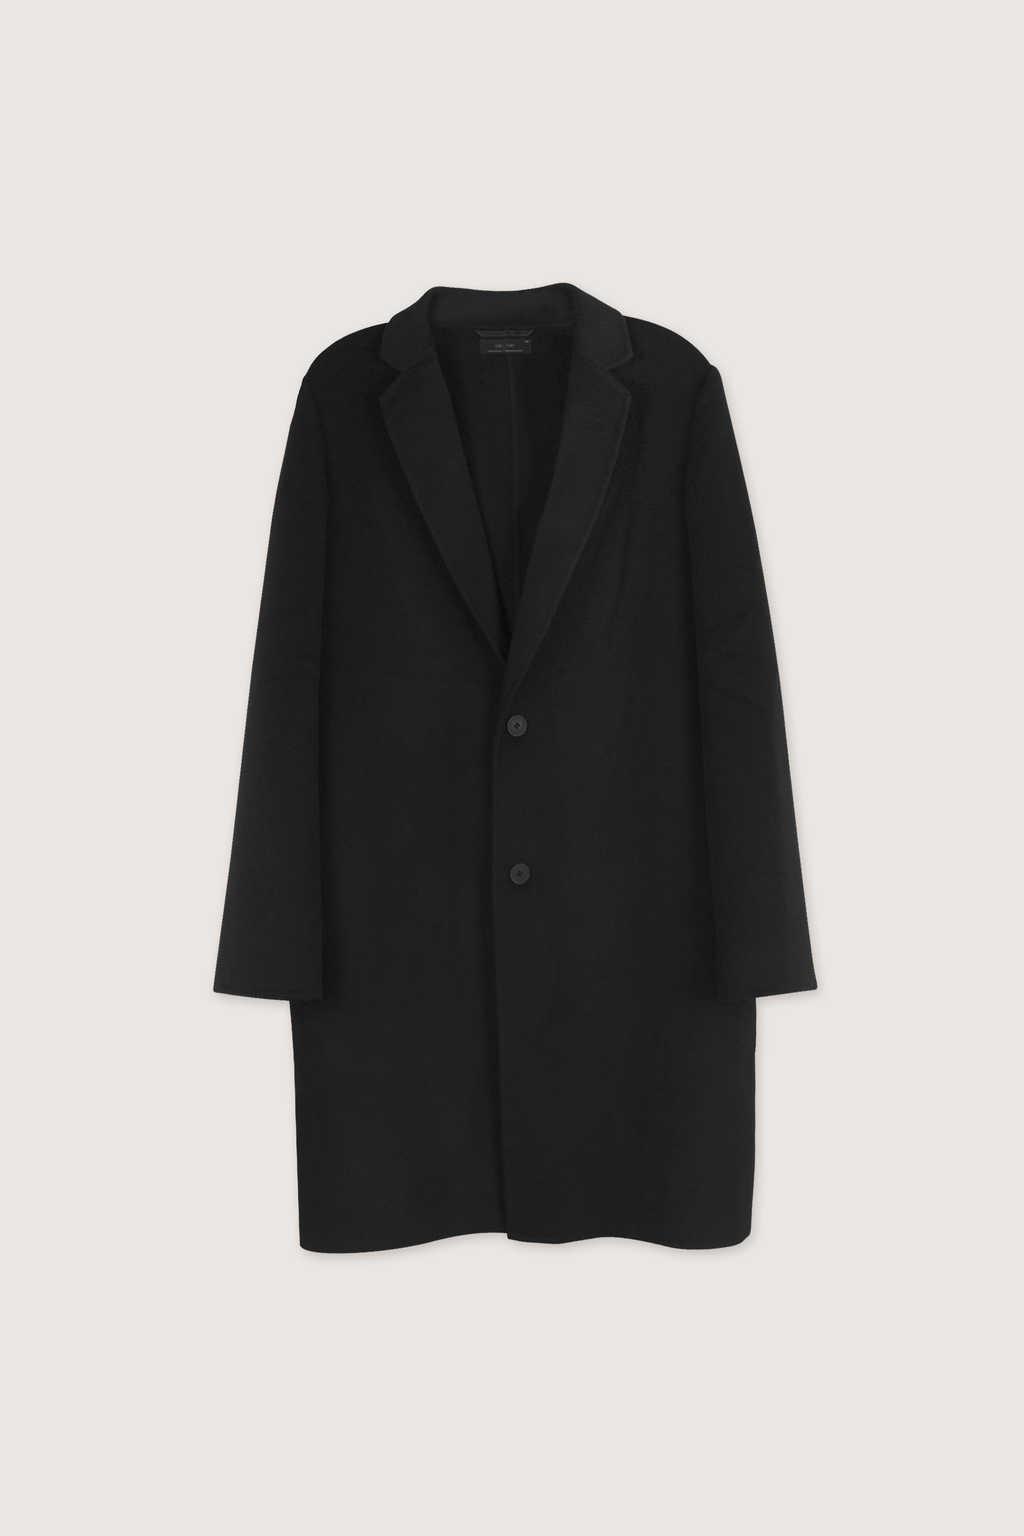 Handmade Coat 1597 Black 7